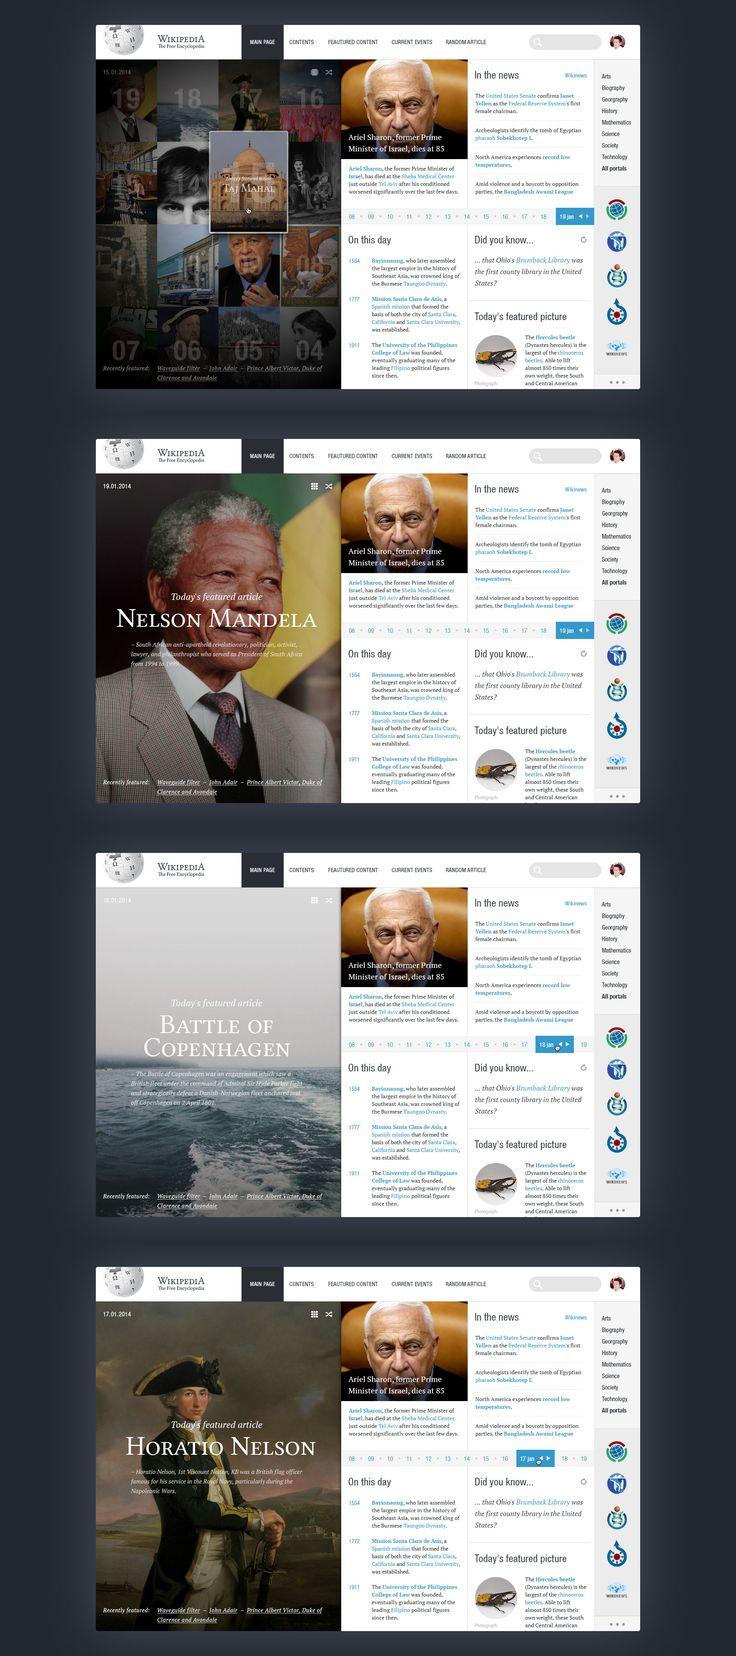 Wikipedia redesign by George Kvasnikov